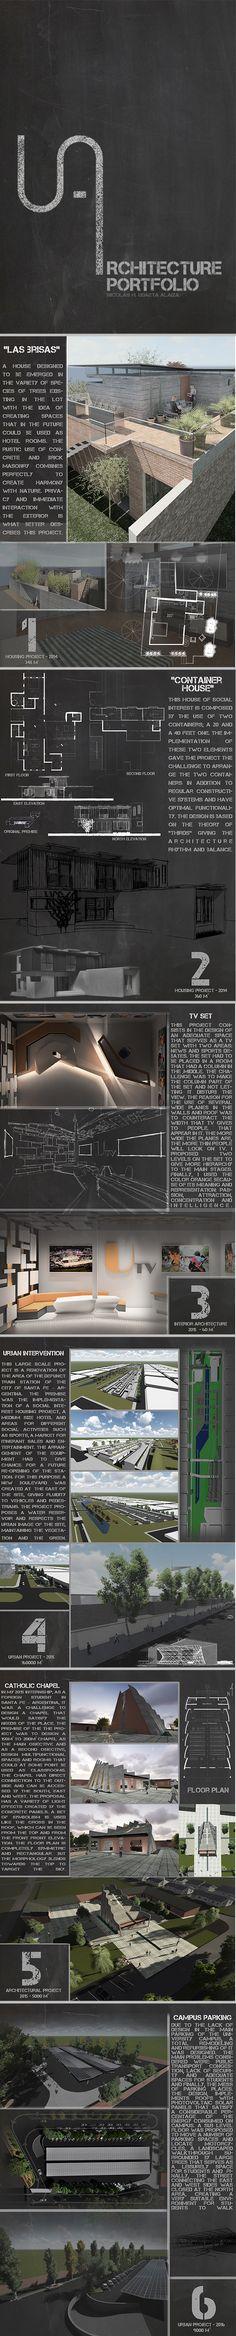 Student Architecture Portfolio                                                                                                                                                                                 More